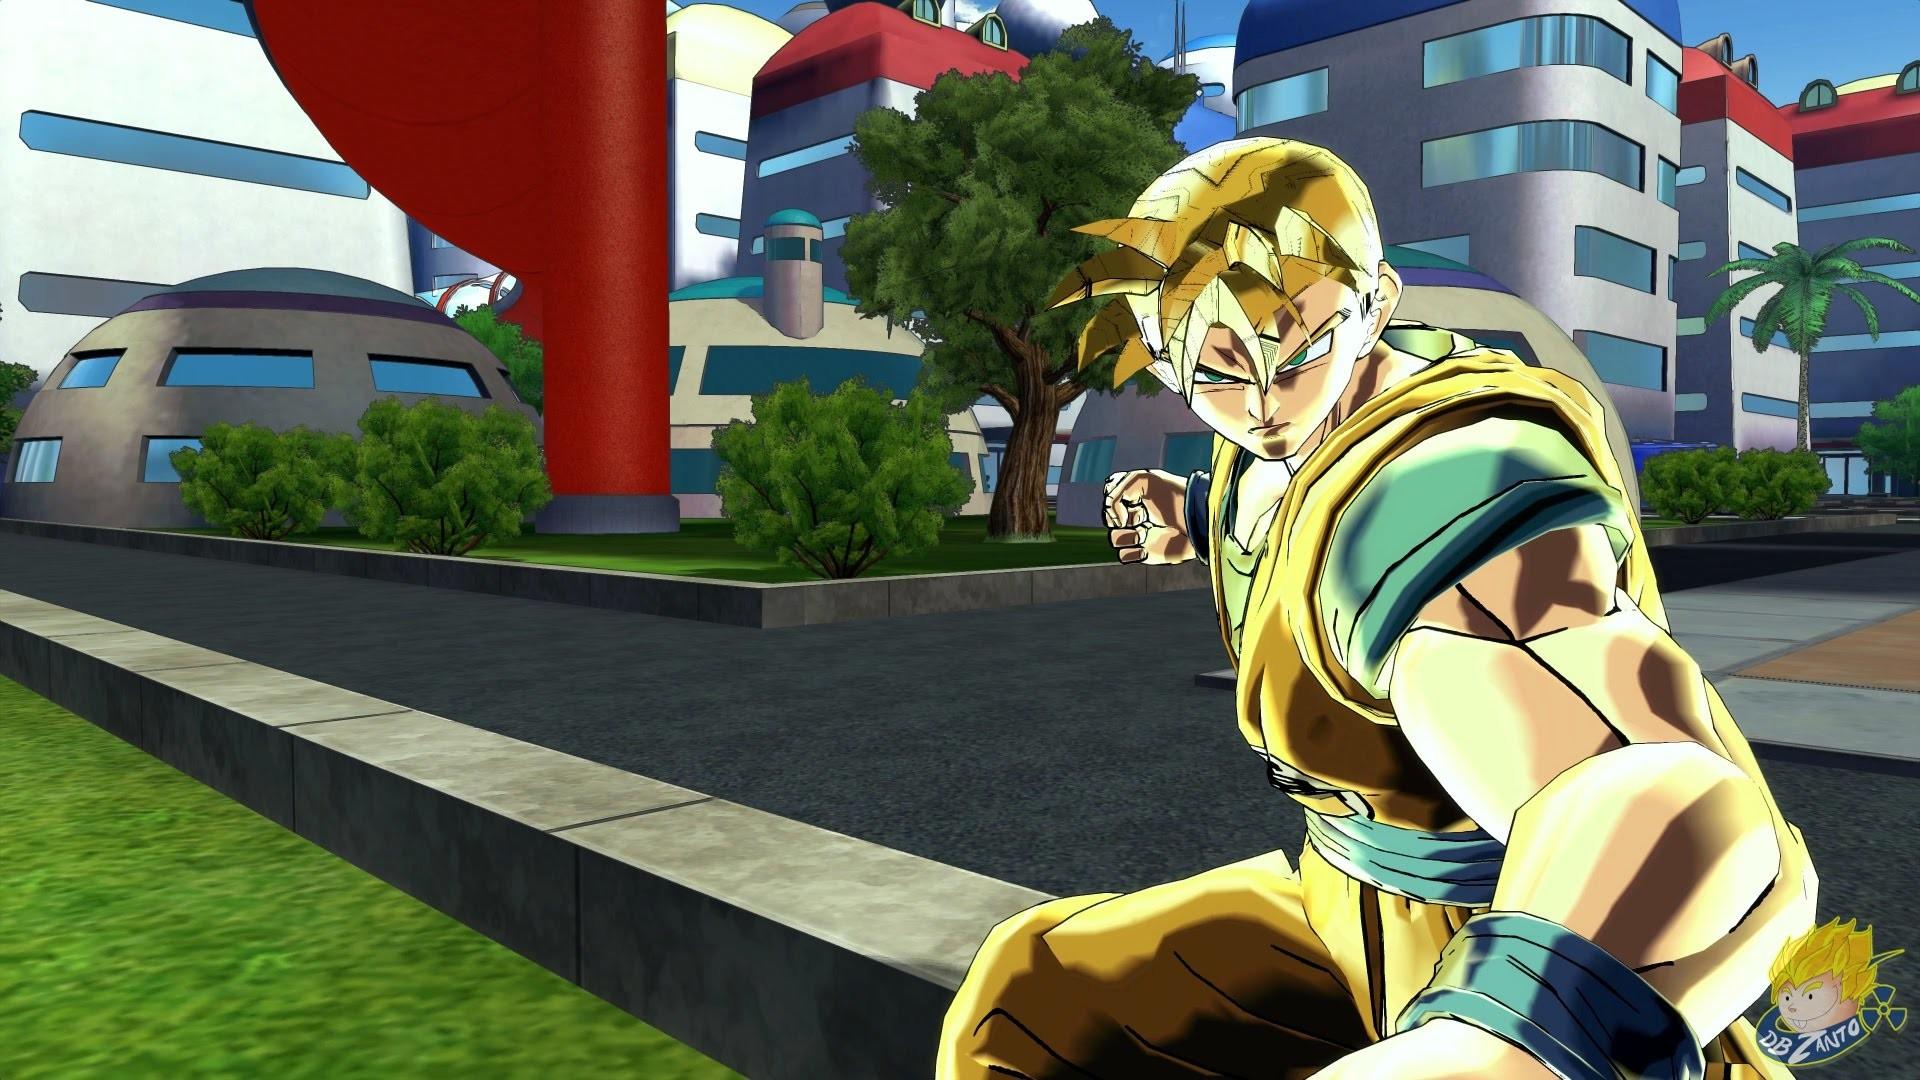 Dragon Ball Xenoverse (PC): Super Saiyan Future Gohan Vs Android #17  Gameplay [MOD] 【60FPS 1080P】 – YouTube